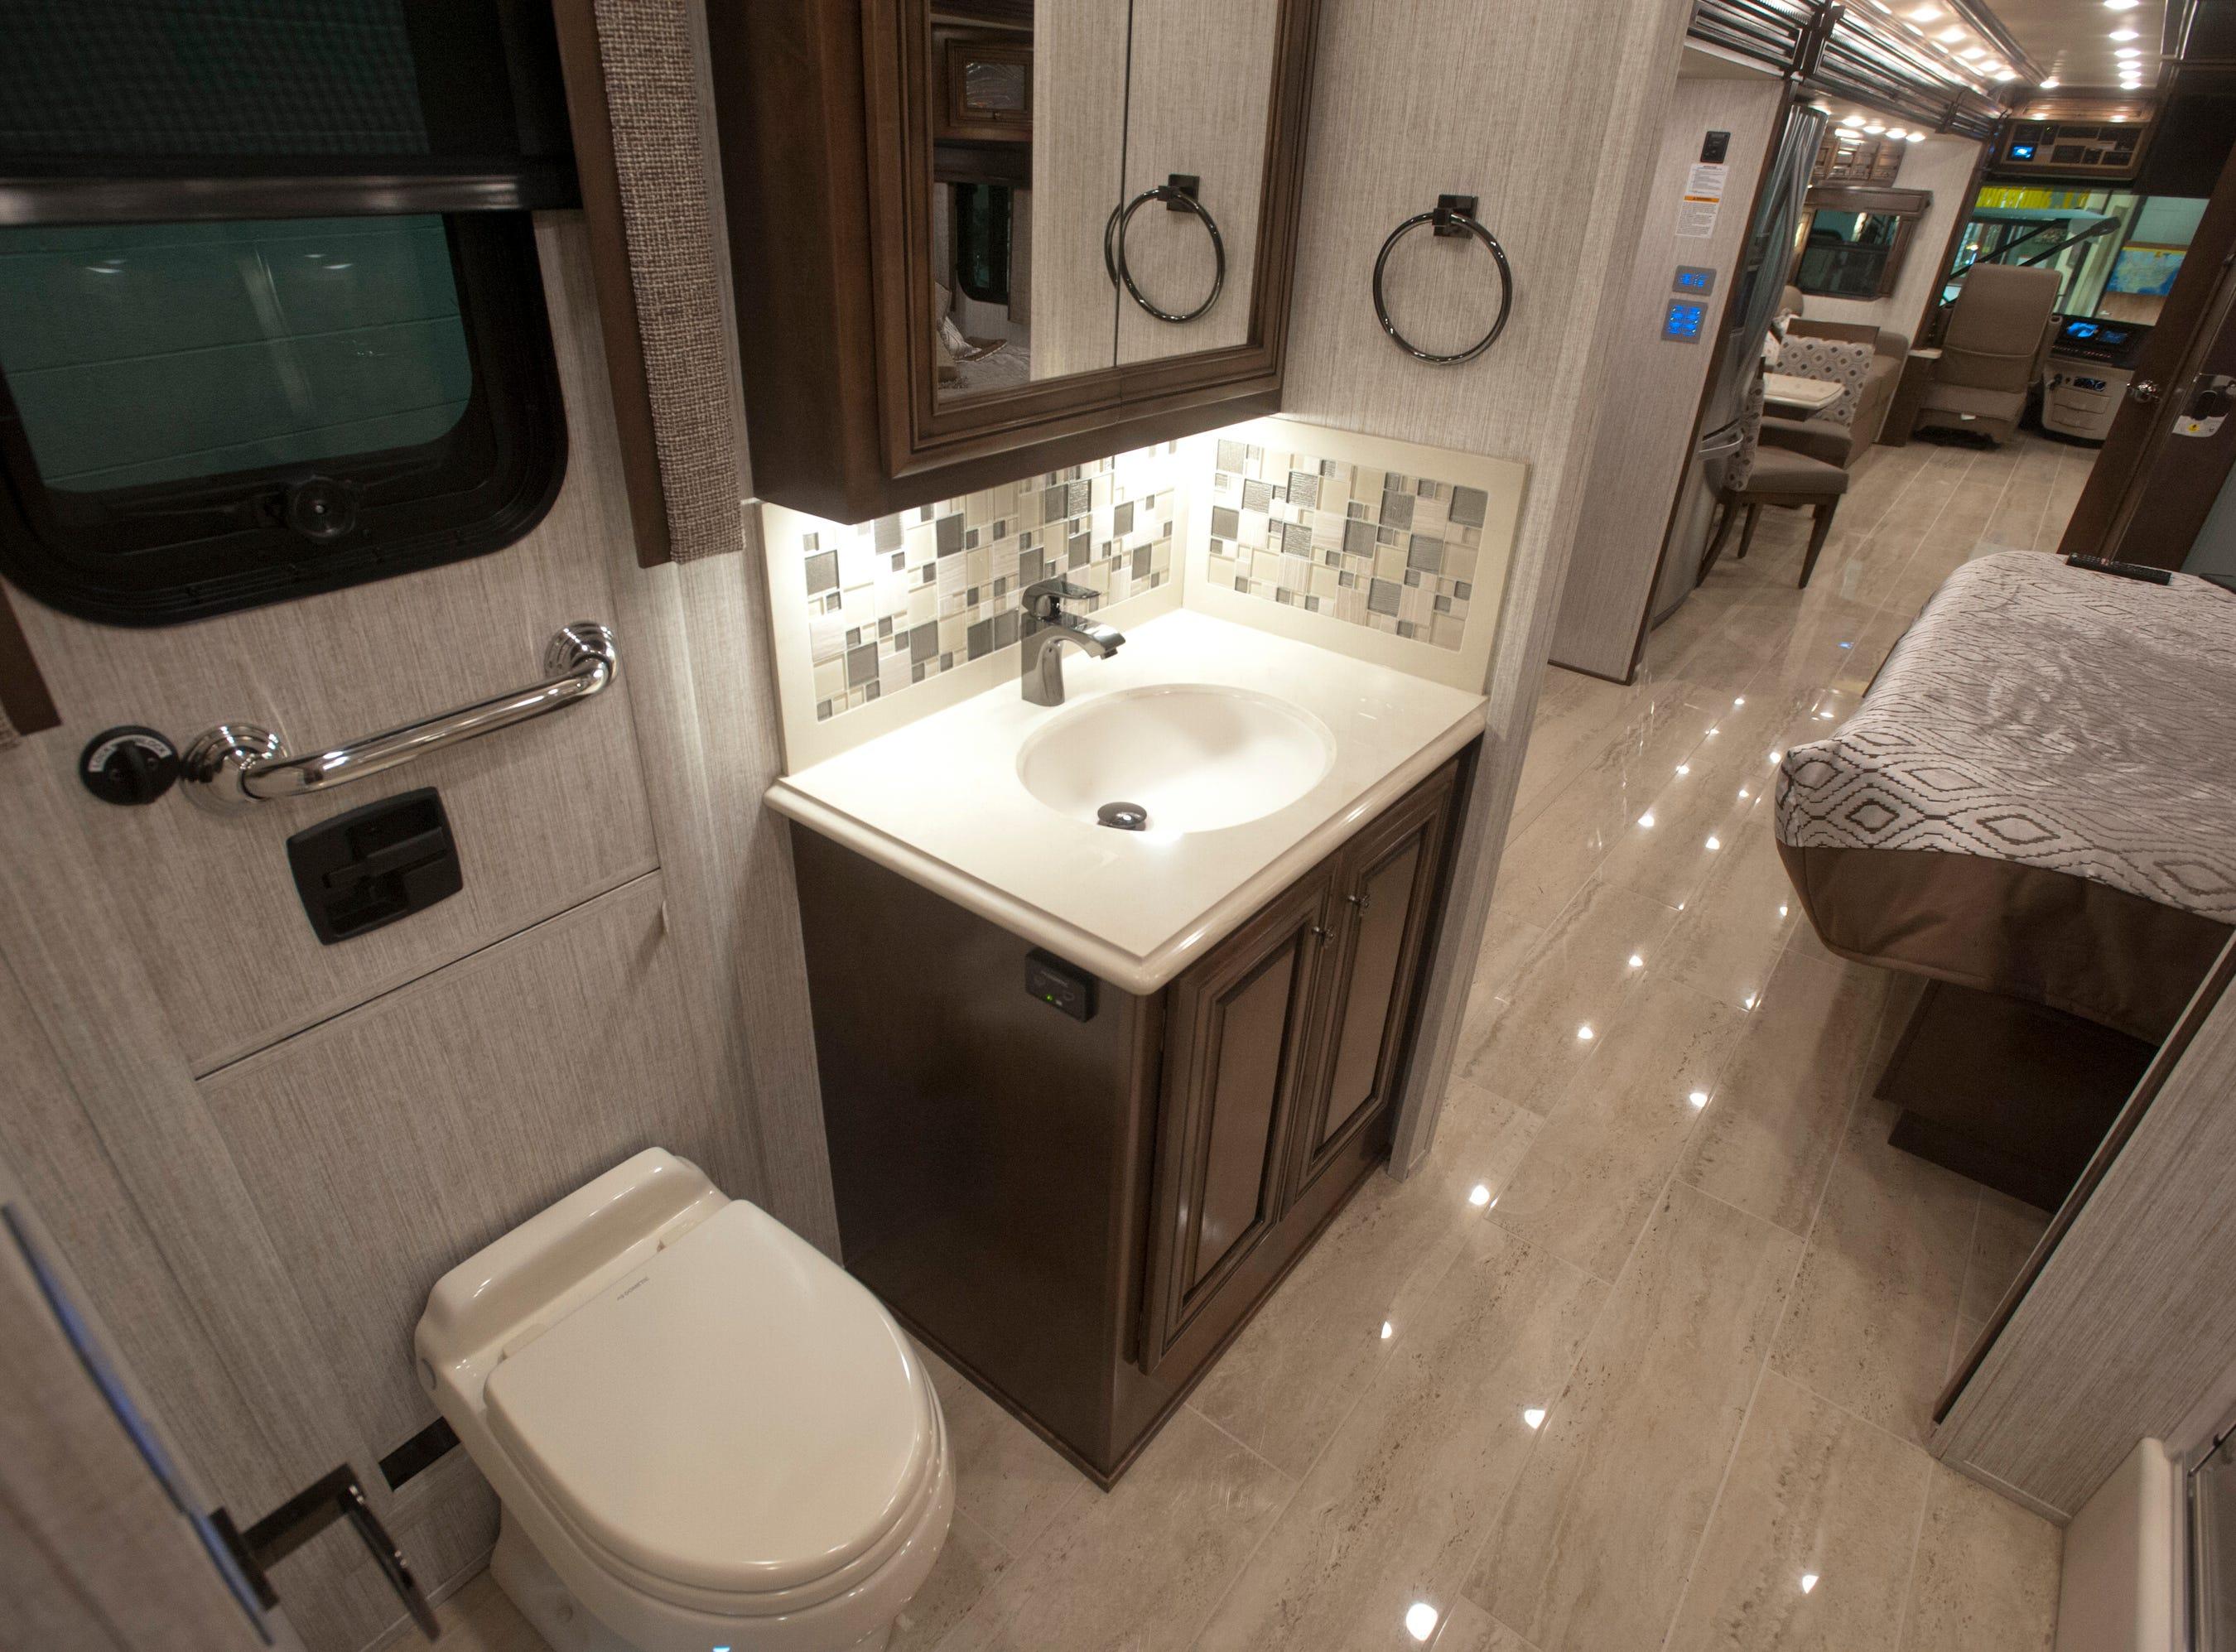 The master suite bathroom.11 December 2018